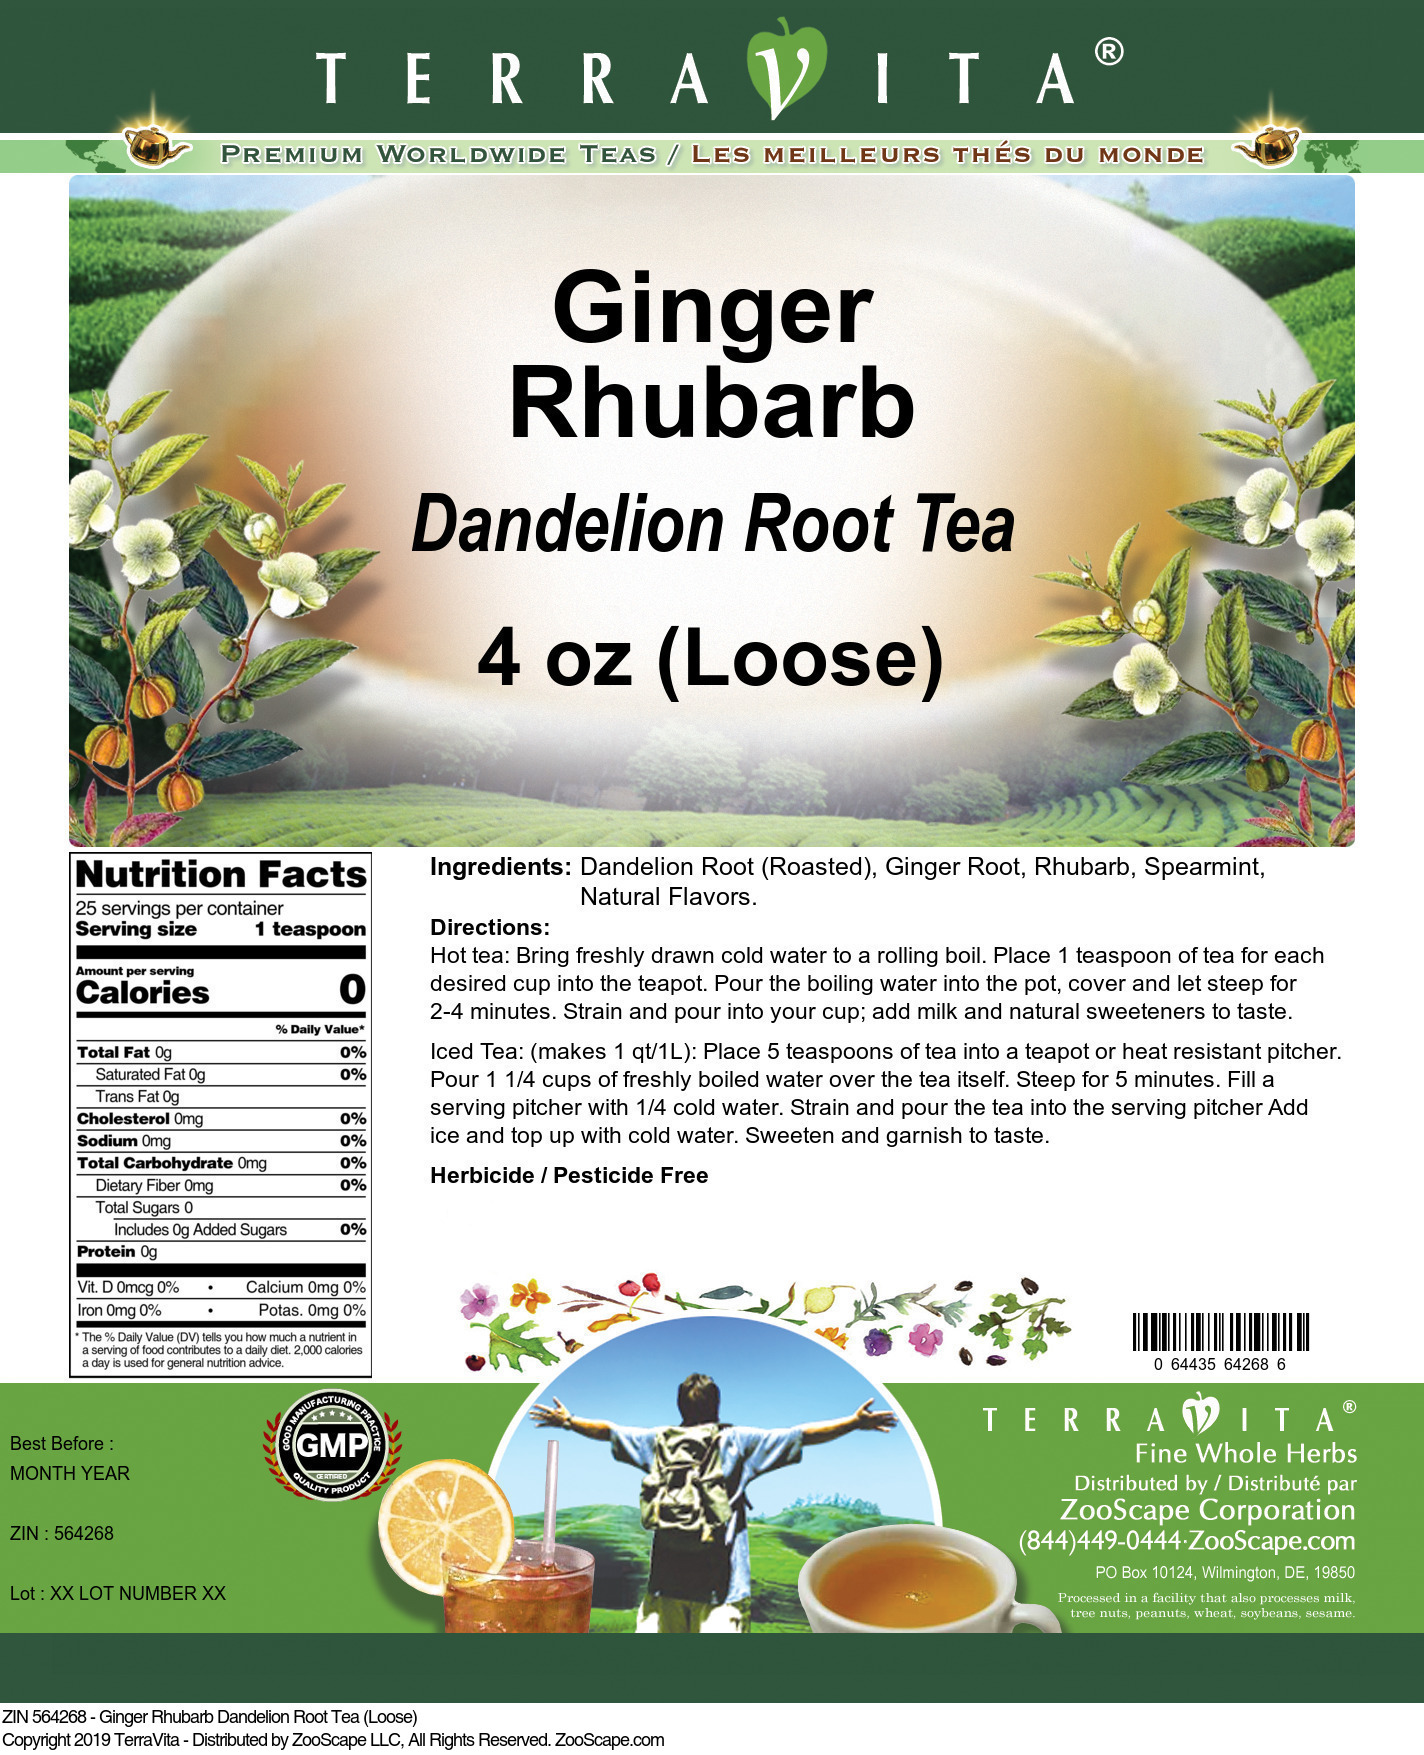 Ginger Rhubarb Dandelion Root Tea (Loose)